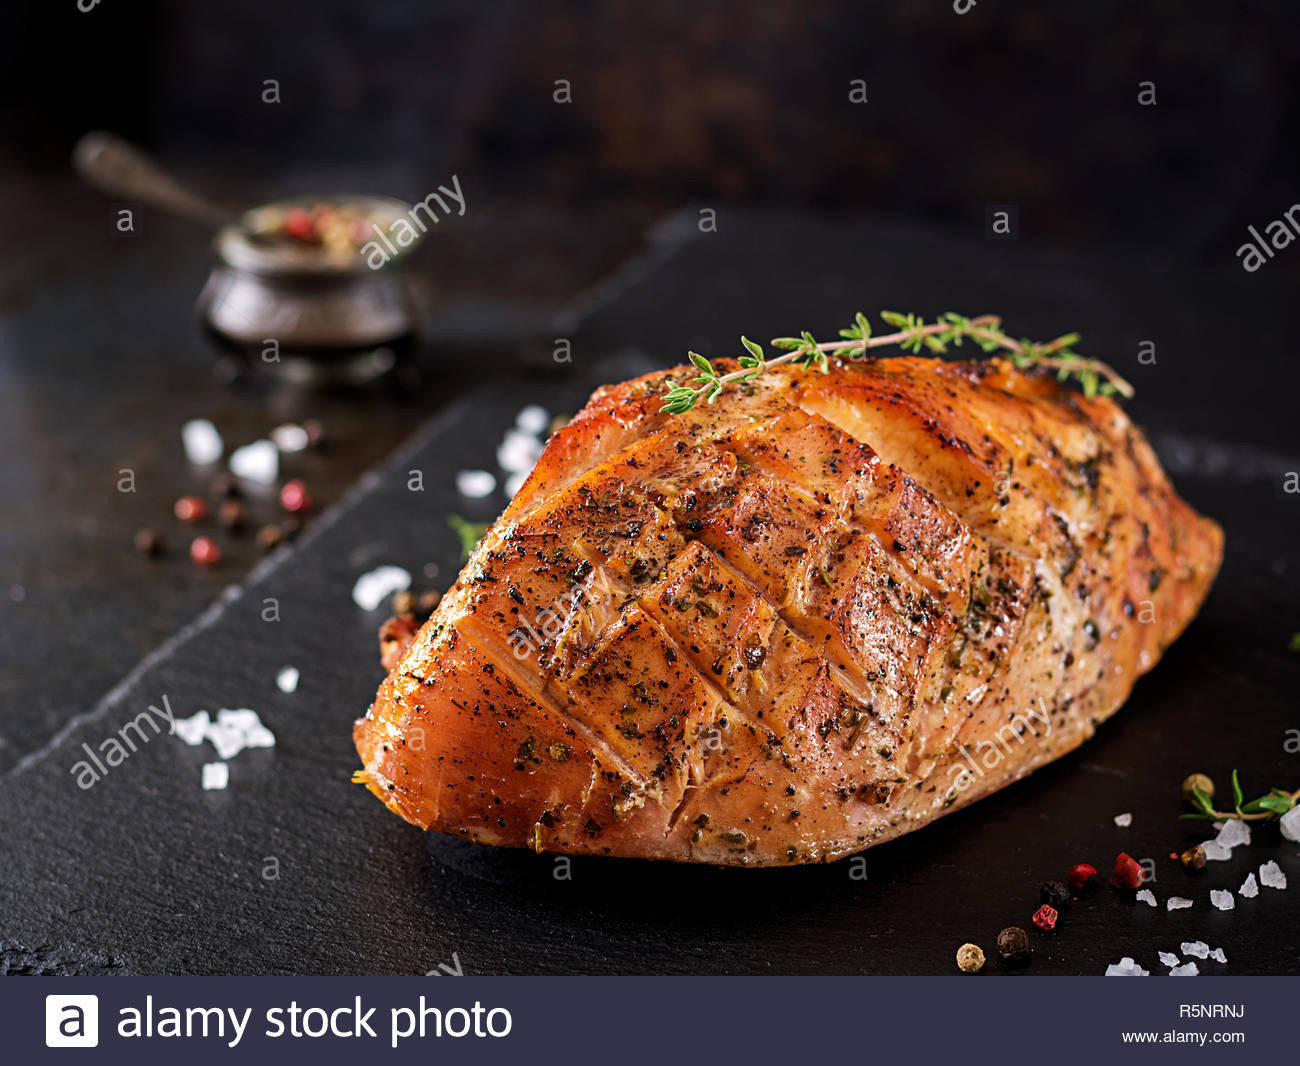 Festival Foods Thanksgiving Dinners  Traditional Christmas Dinner Turkey Ham Stock s